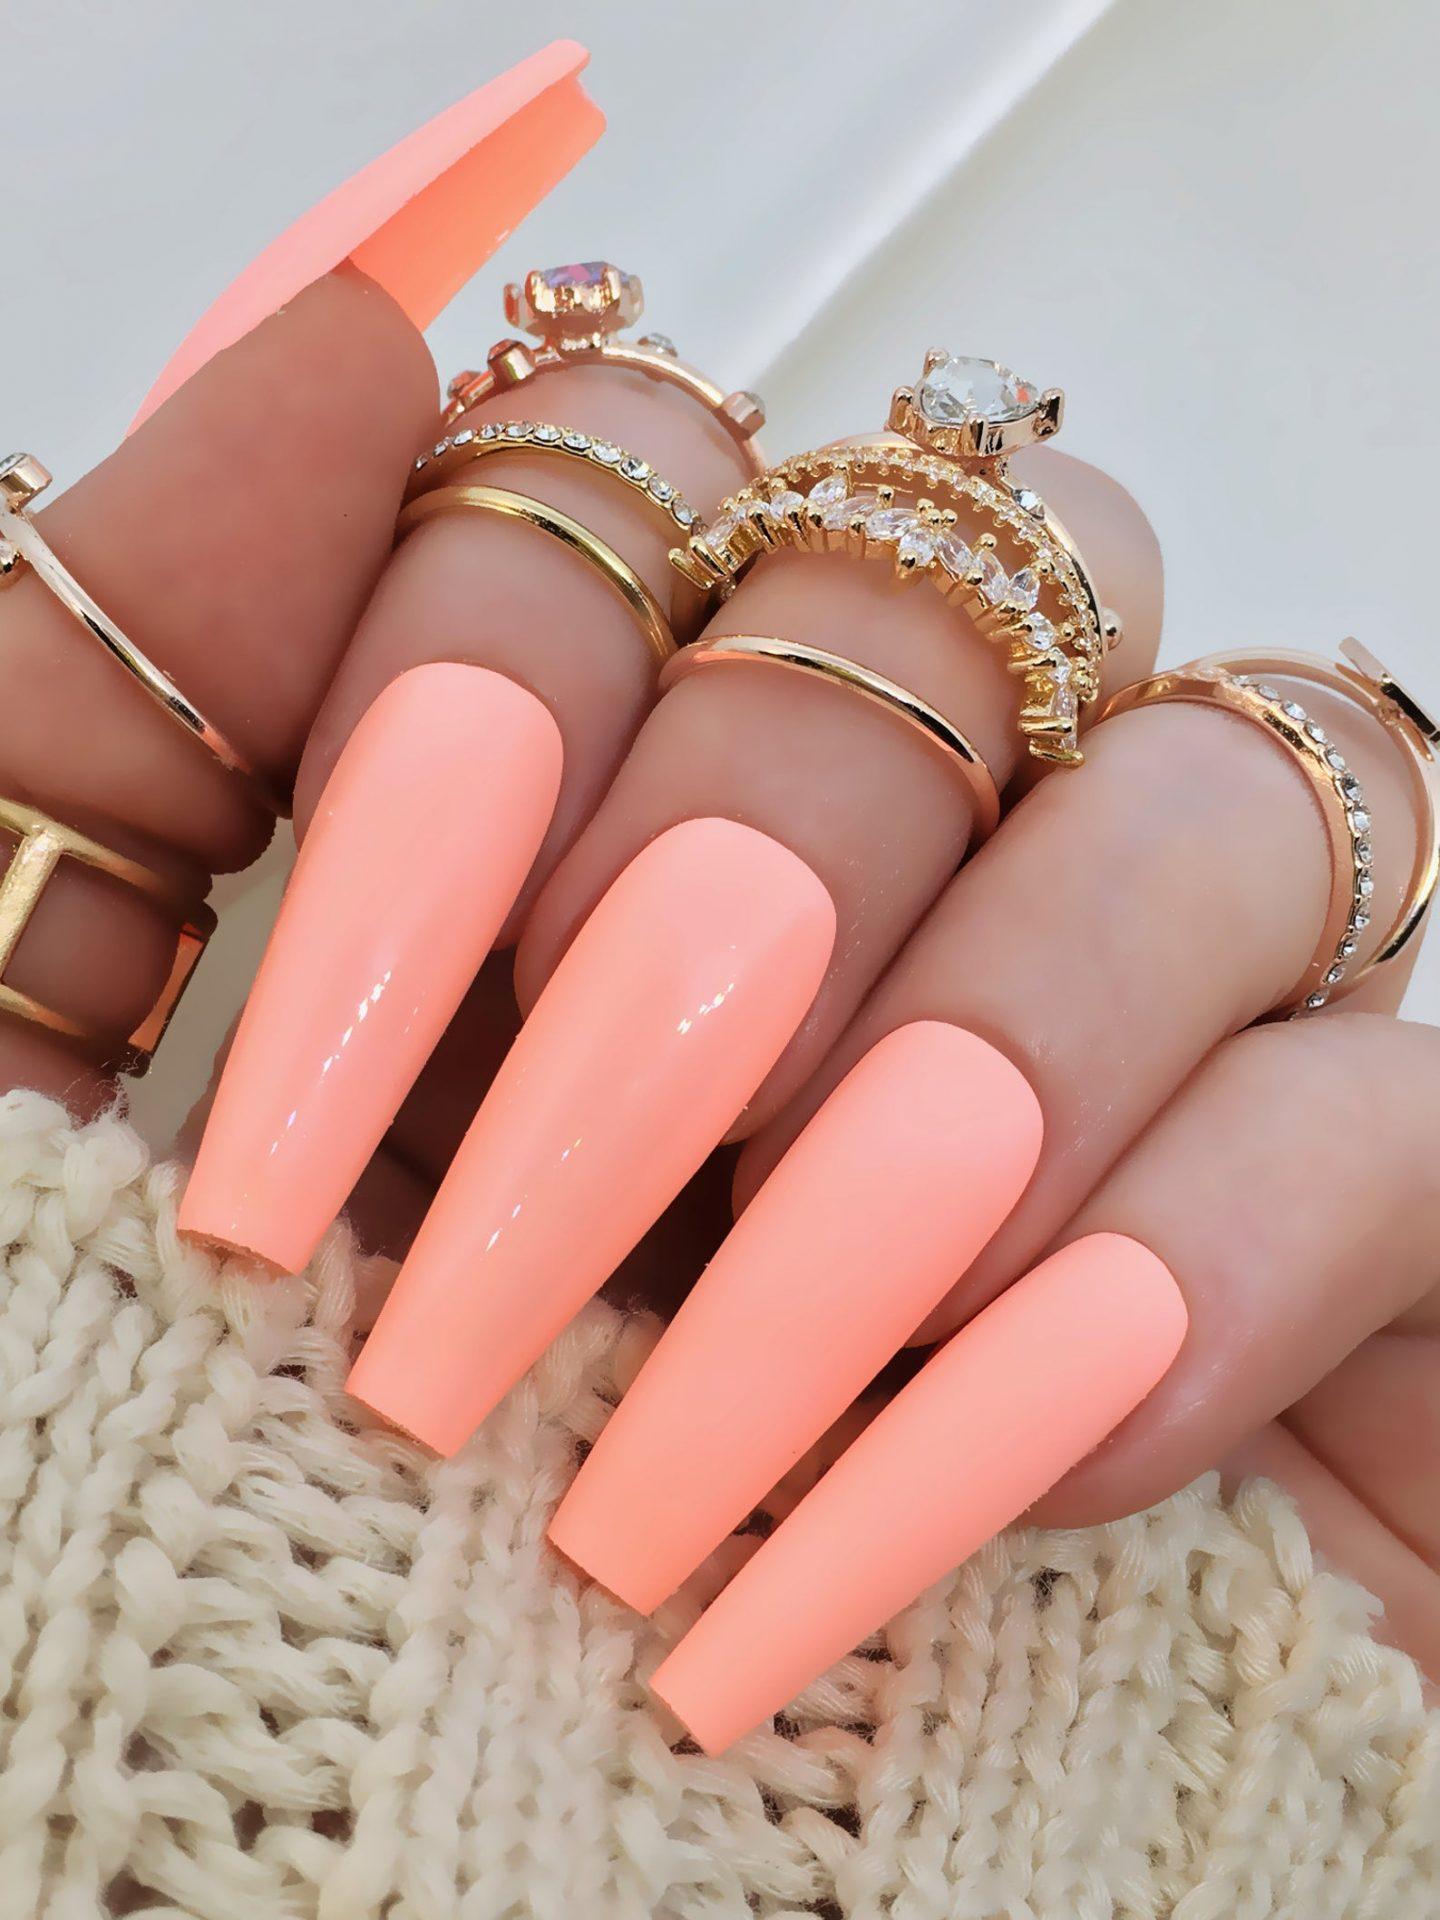 Pastel orange coffin nails for summer